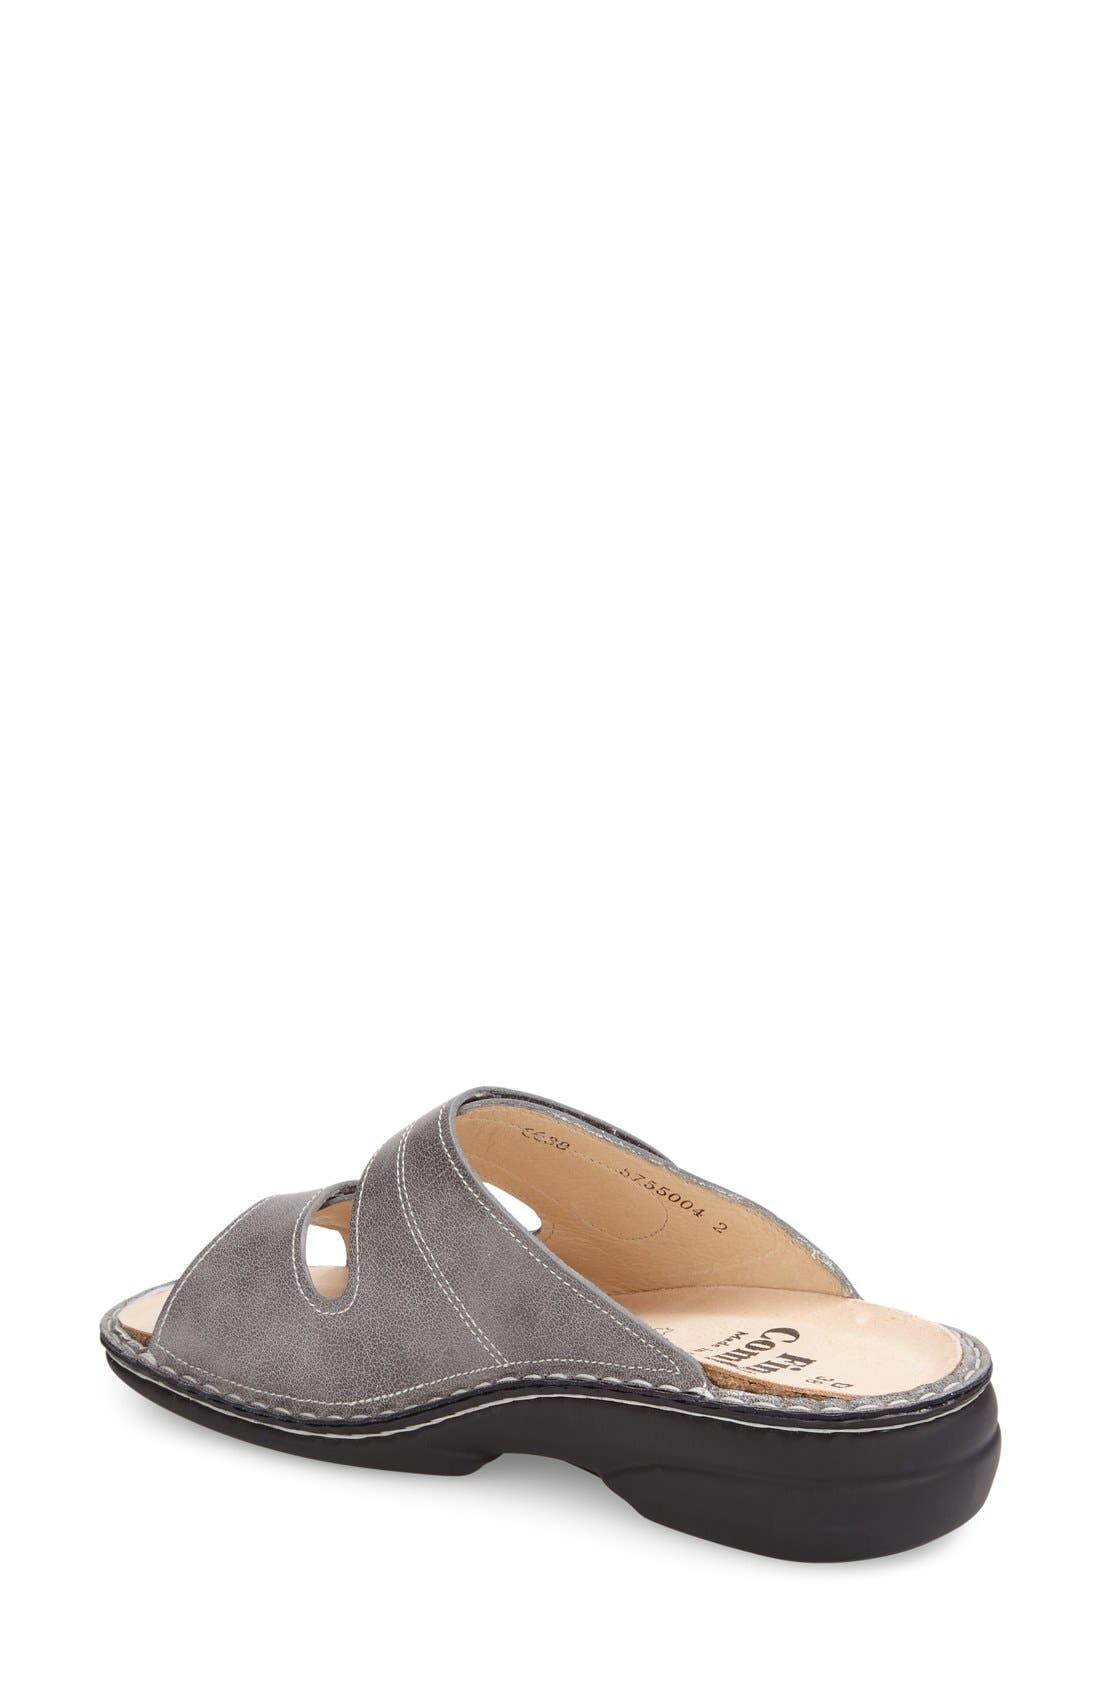 'Sansibar' Sandal,                             Alternate thumbnail 2, color,                             Grey Nappa Leather